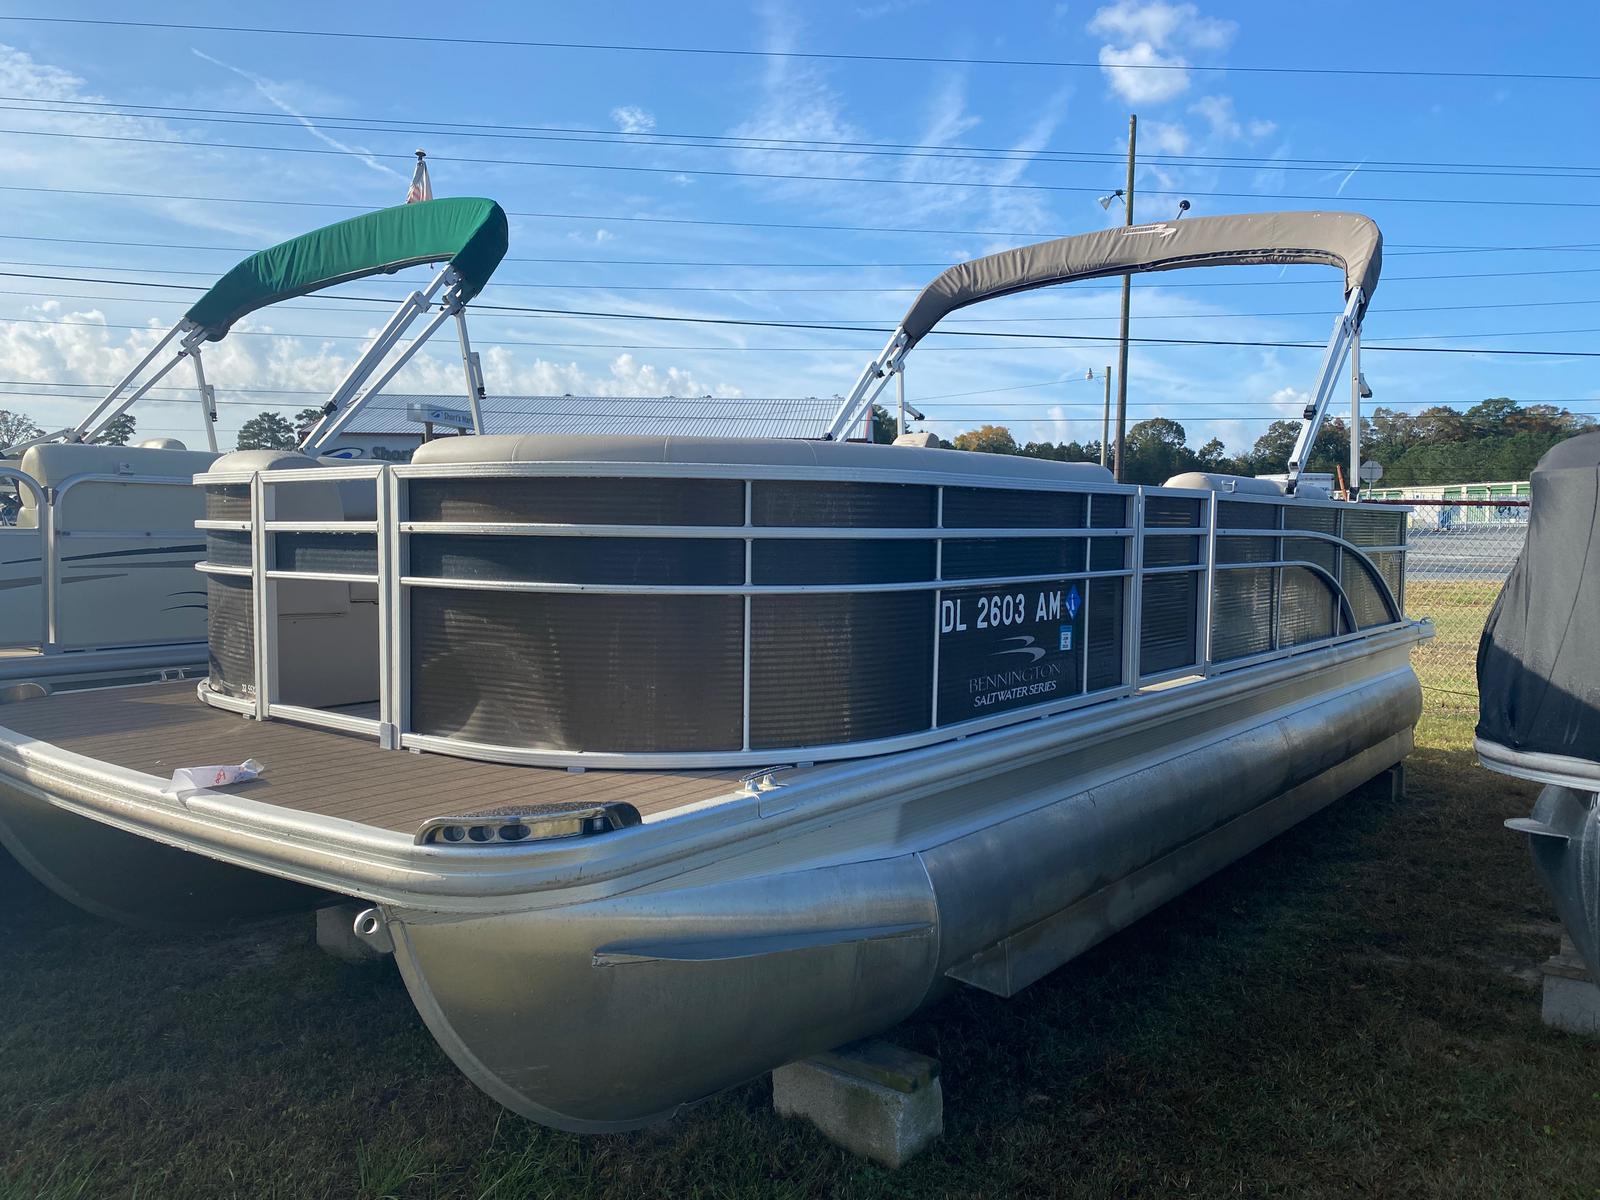 2018 Bennington boat for sale, model of the boat is 22 SSX Pontoon & Image # 1 of 13